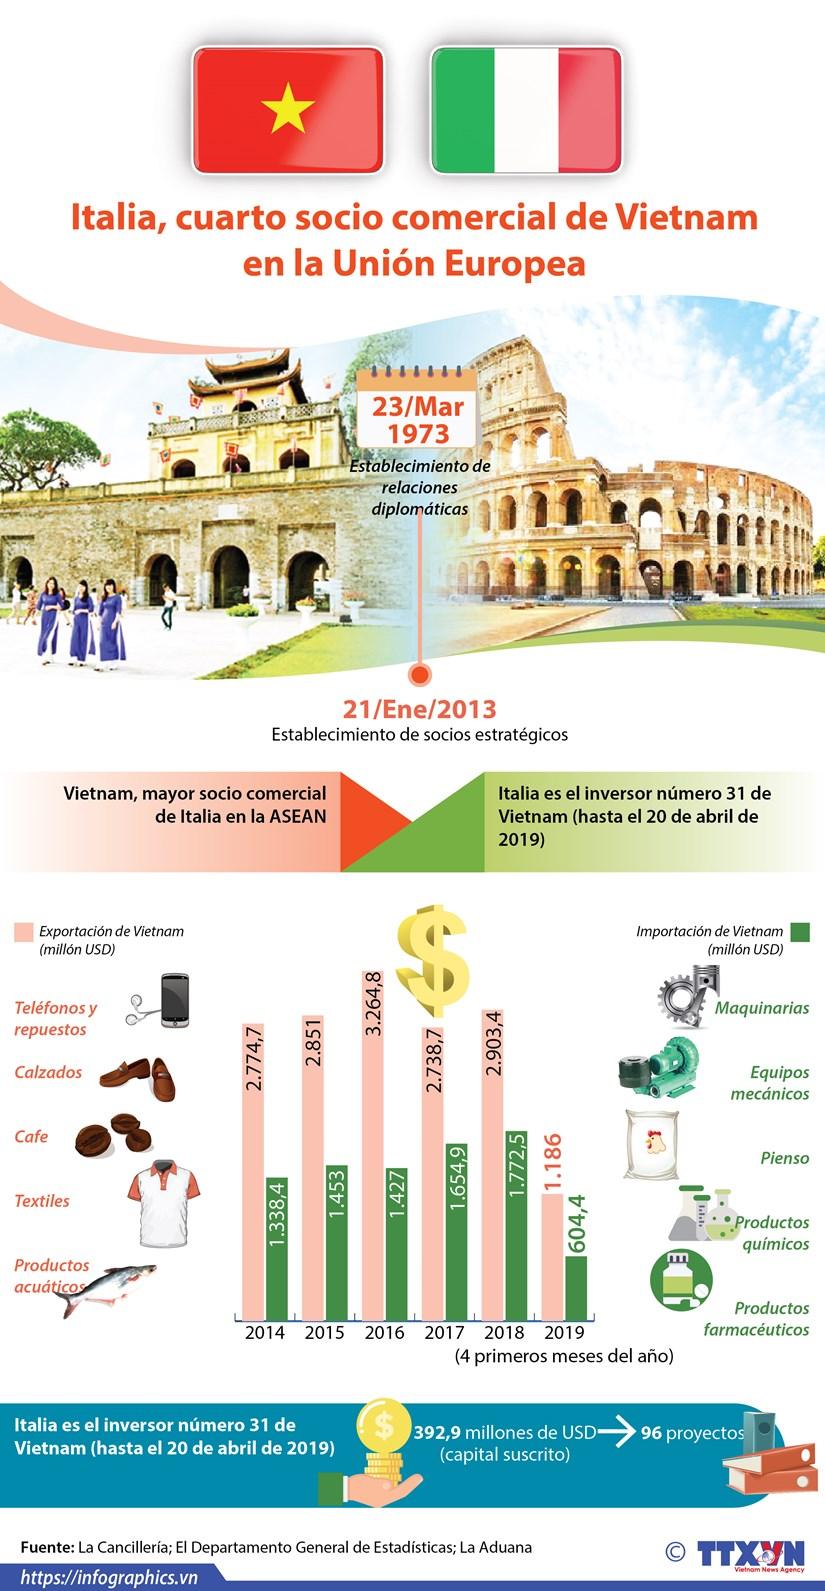 [Info] Italia, cuarto socio comercial de Vietnam en la Union Europea hinh anh 1